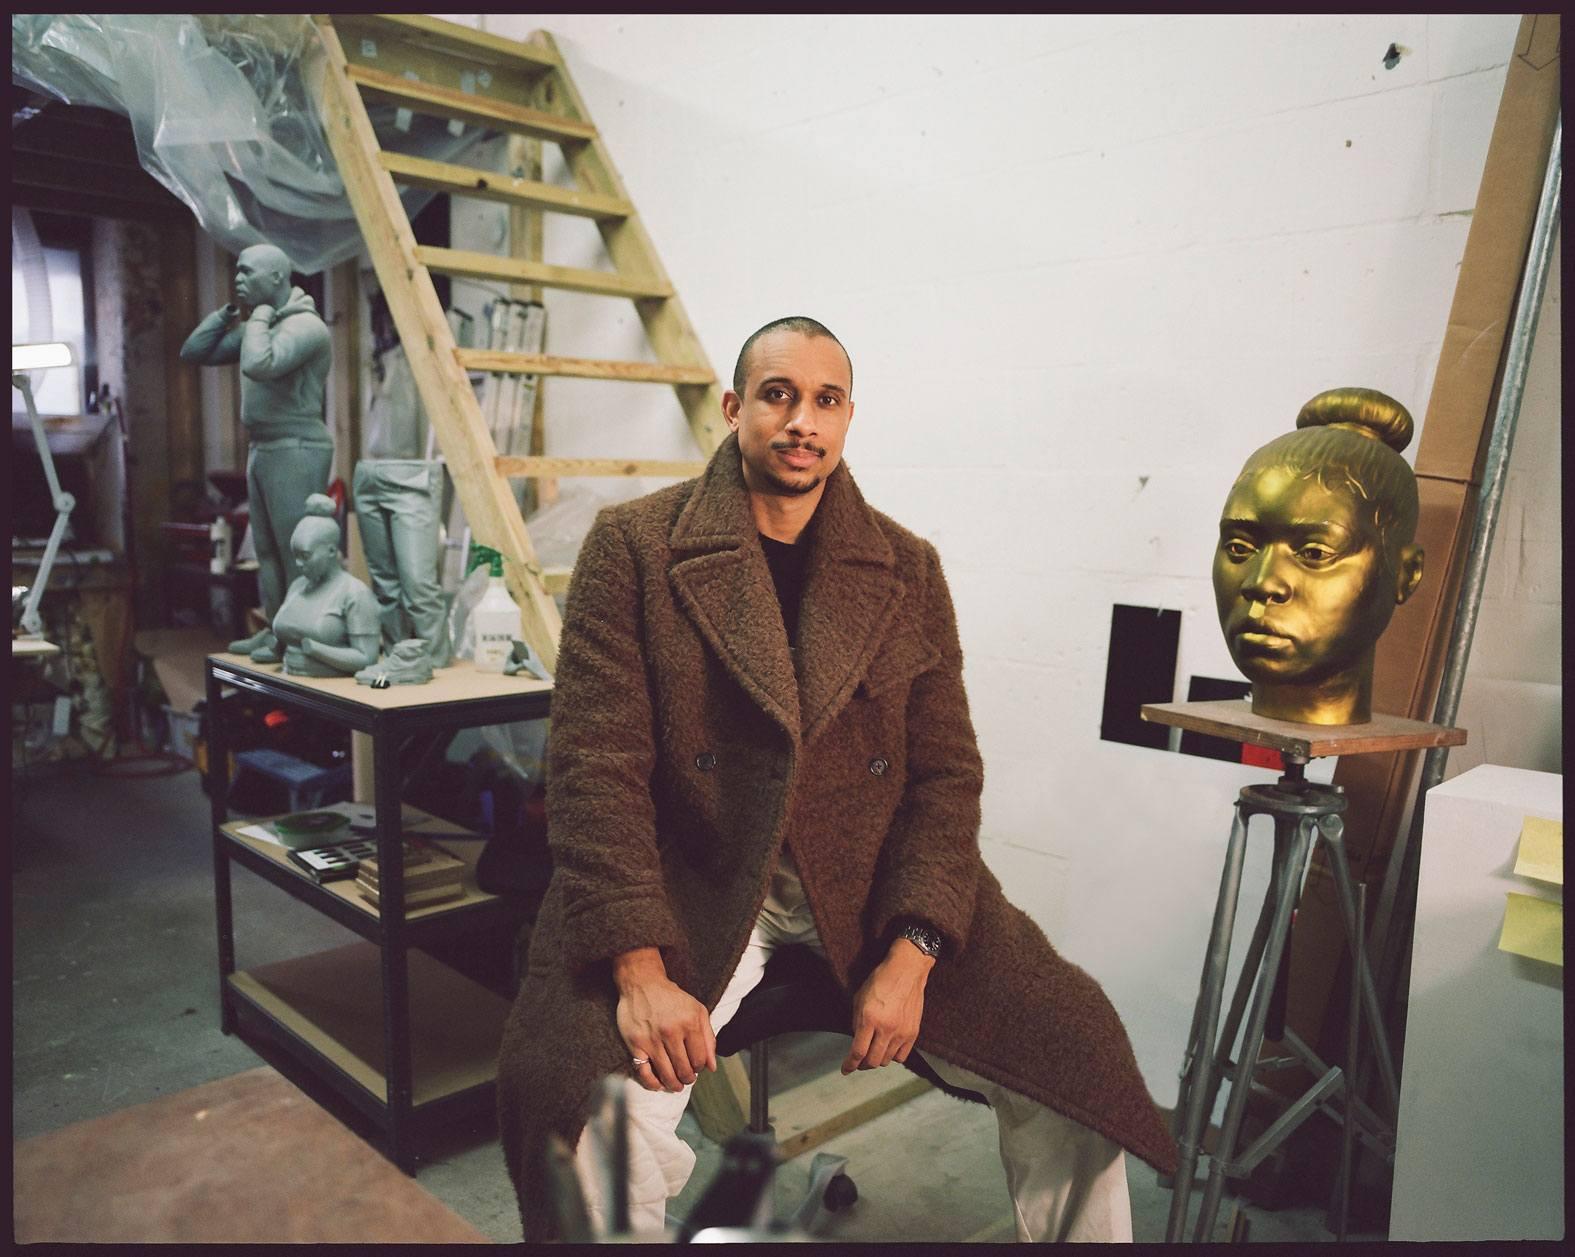 Sculptor Thomas J Price Wears the 'Teddy-Polo' Coat